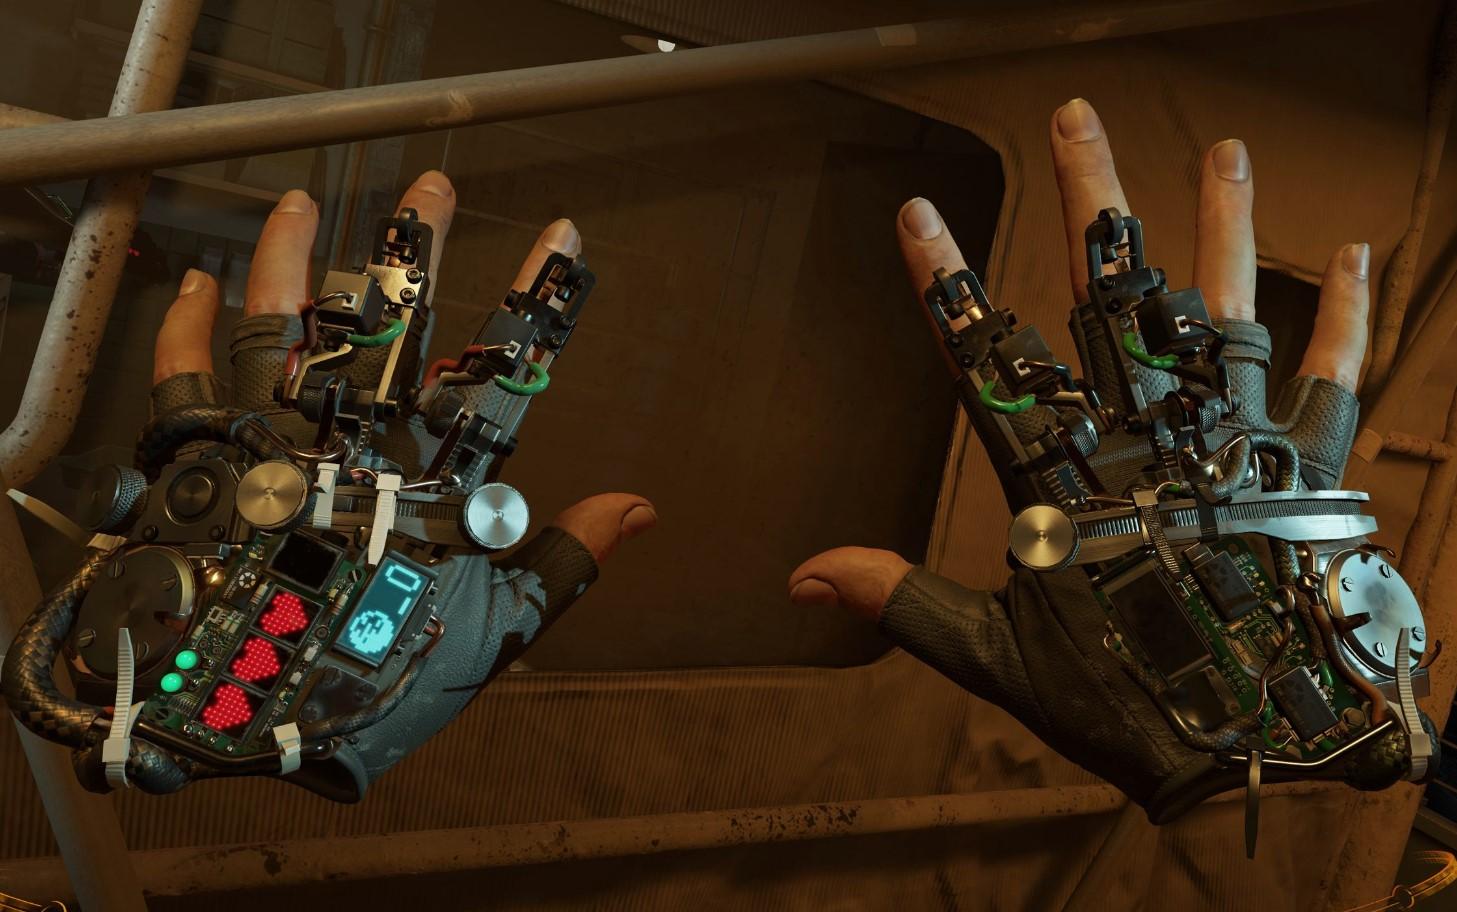 Novedades de la semana: Half-Life Alyx lleva al VR a una franquicia histórica de PC